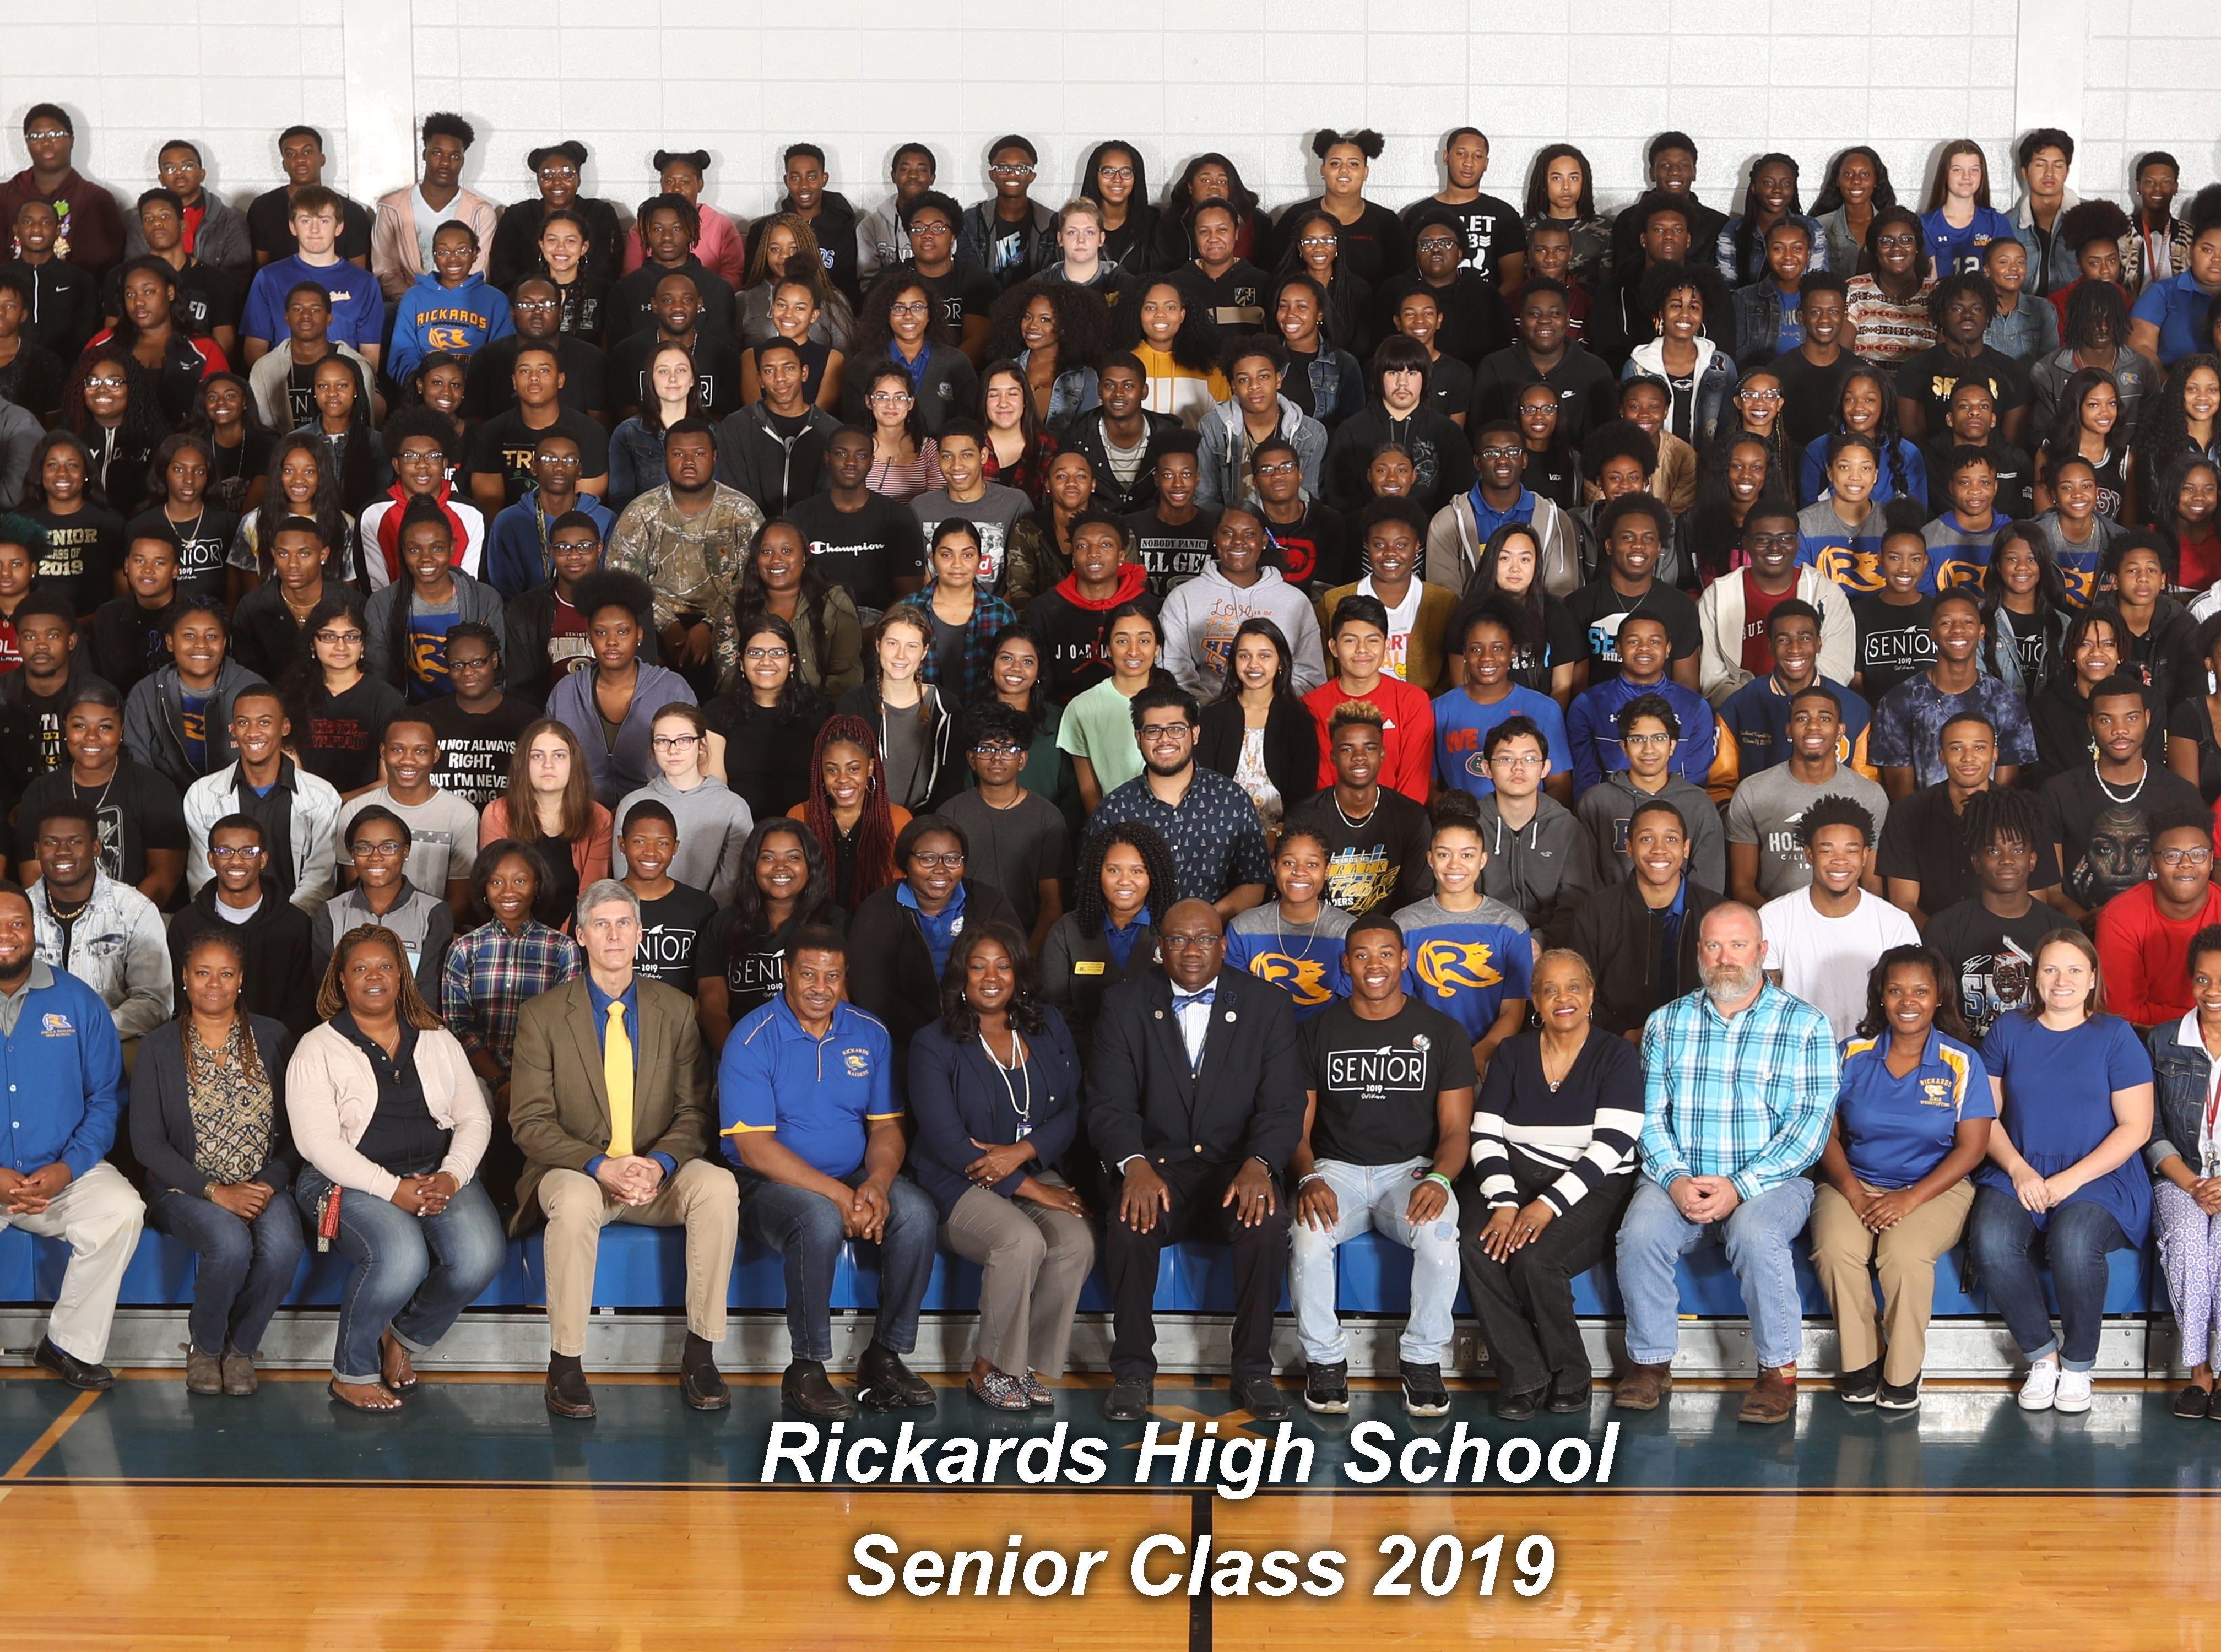 The 2019 senior class at Rickards High School.